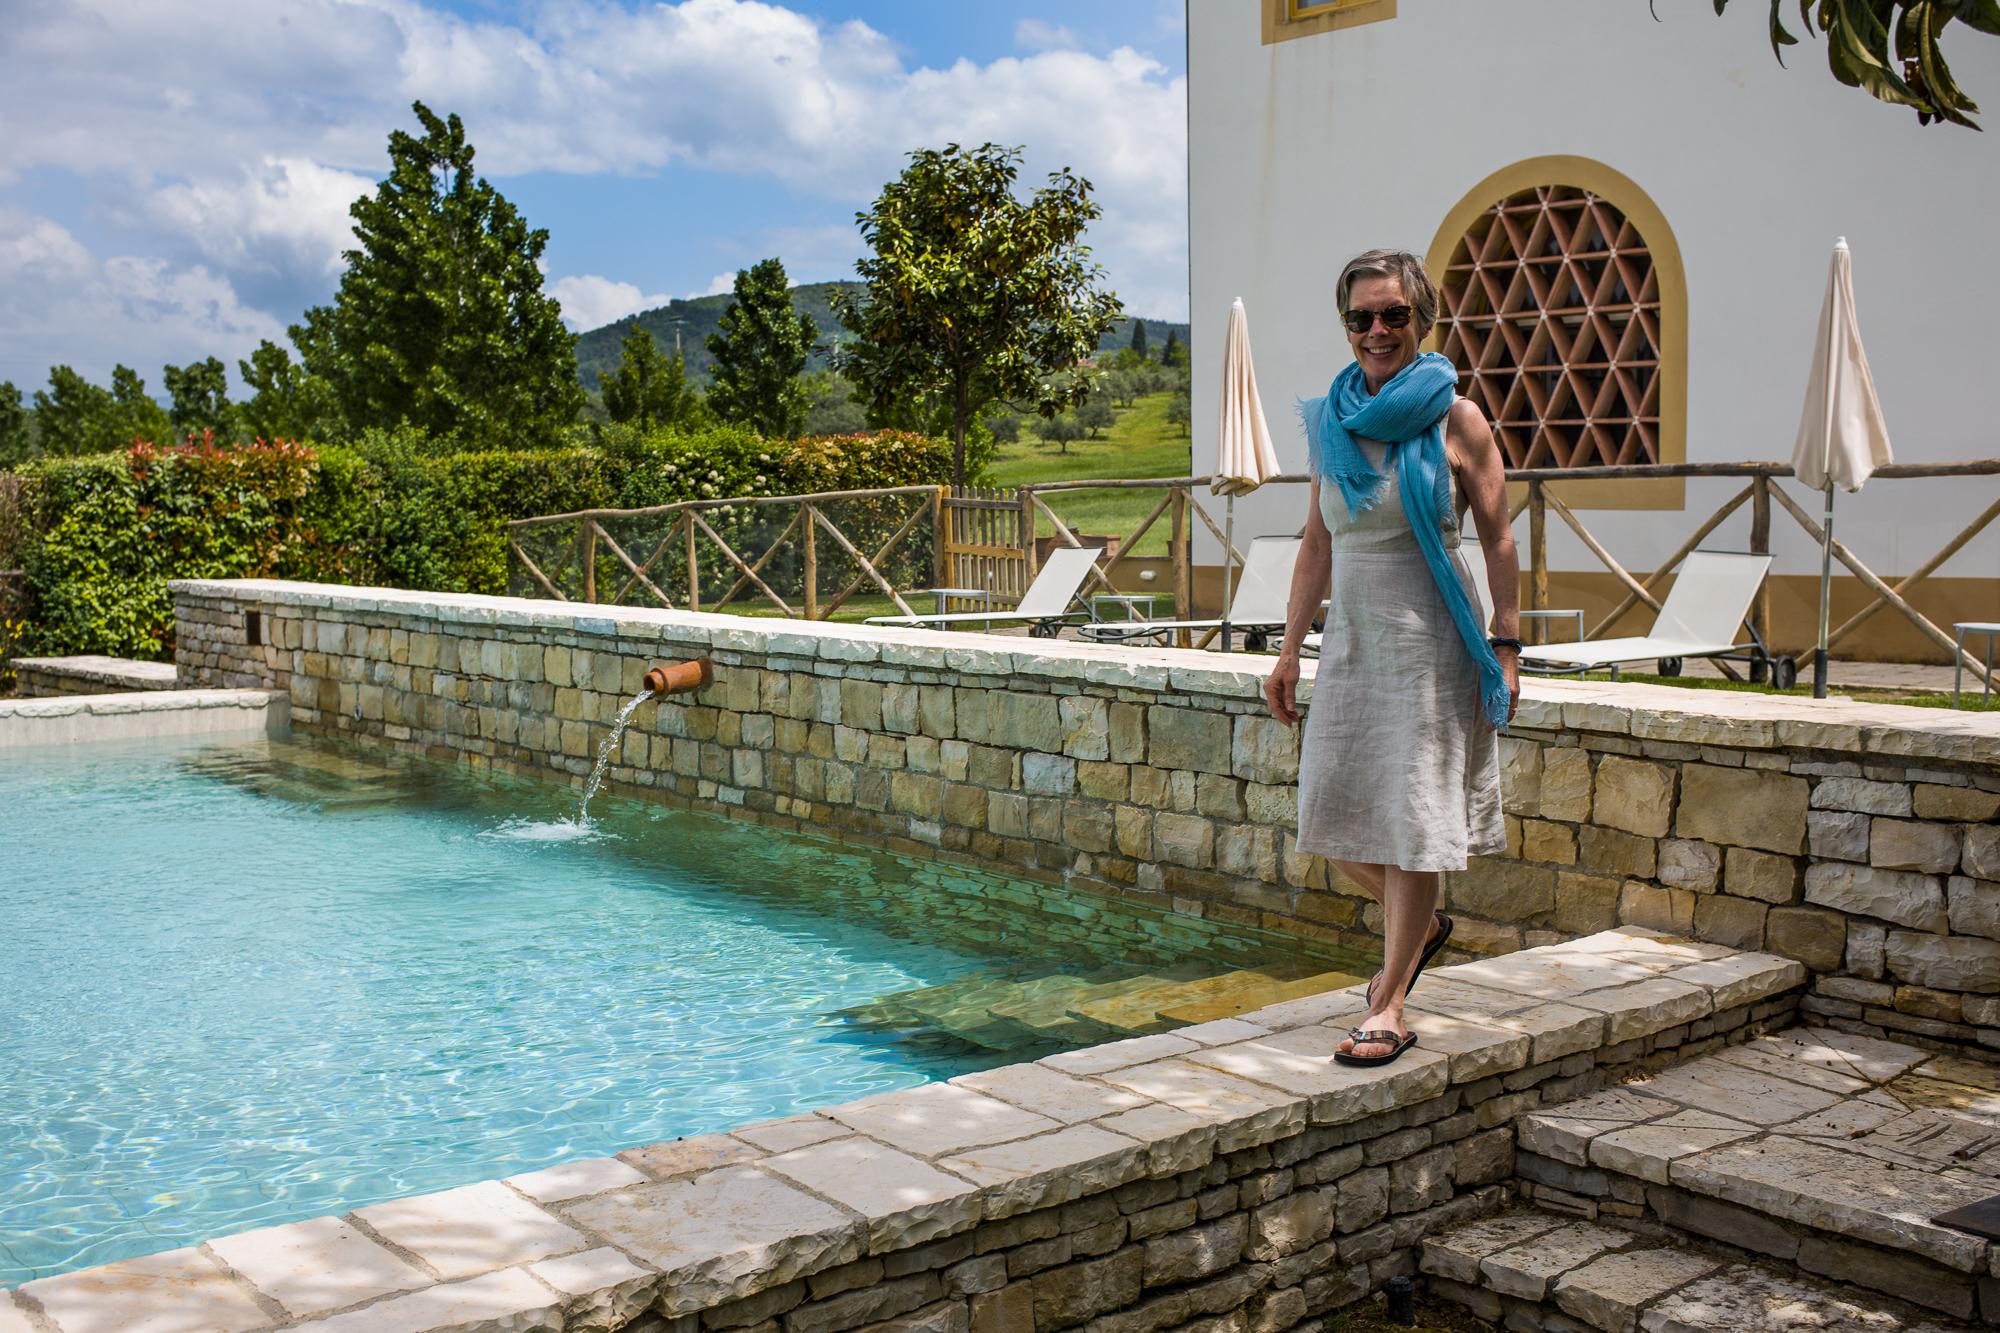 Enjoying the pool at the THIRDHOME Villa